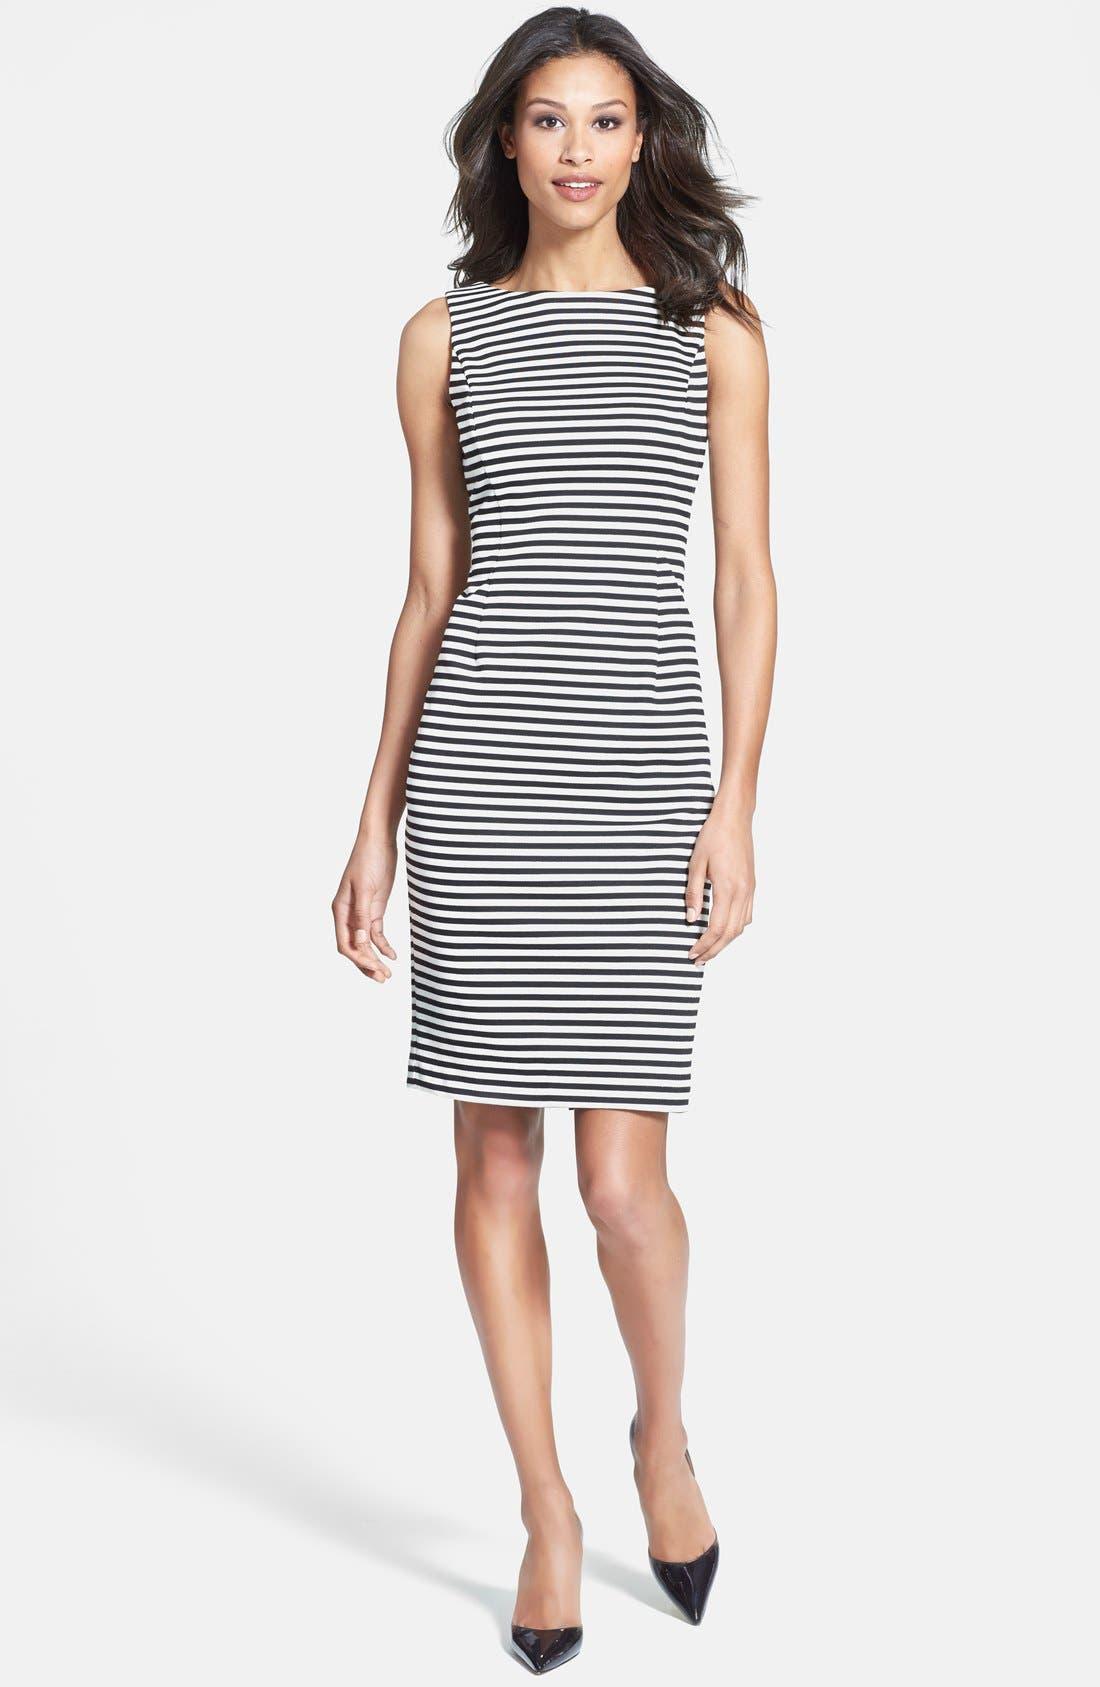 Alternate Image 1 Selected - Isaac Mizrahi New York Stripe Sleeveless Ponte Knit Sheath Dress